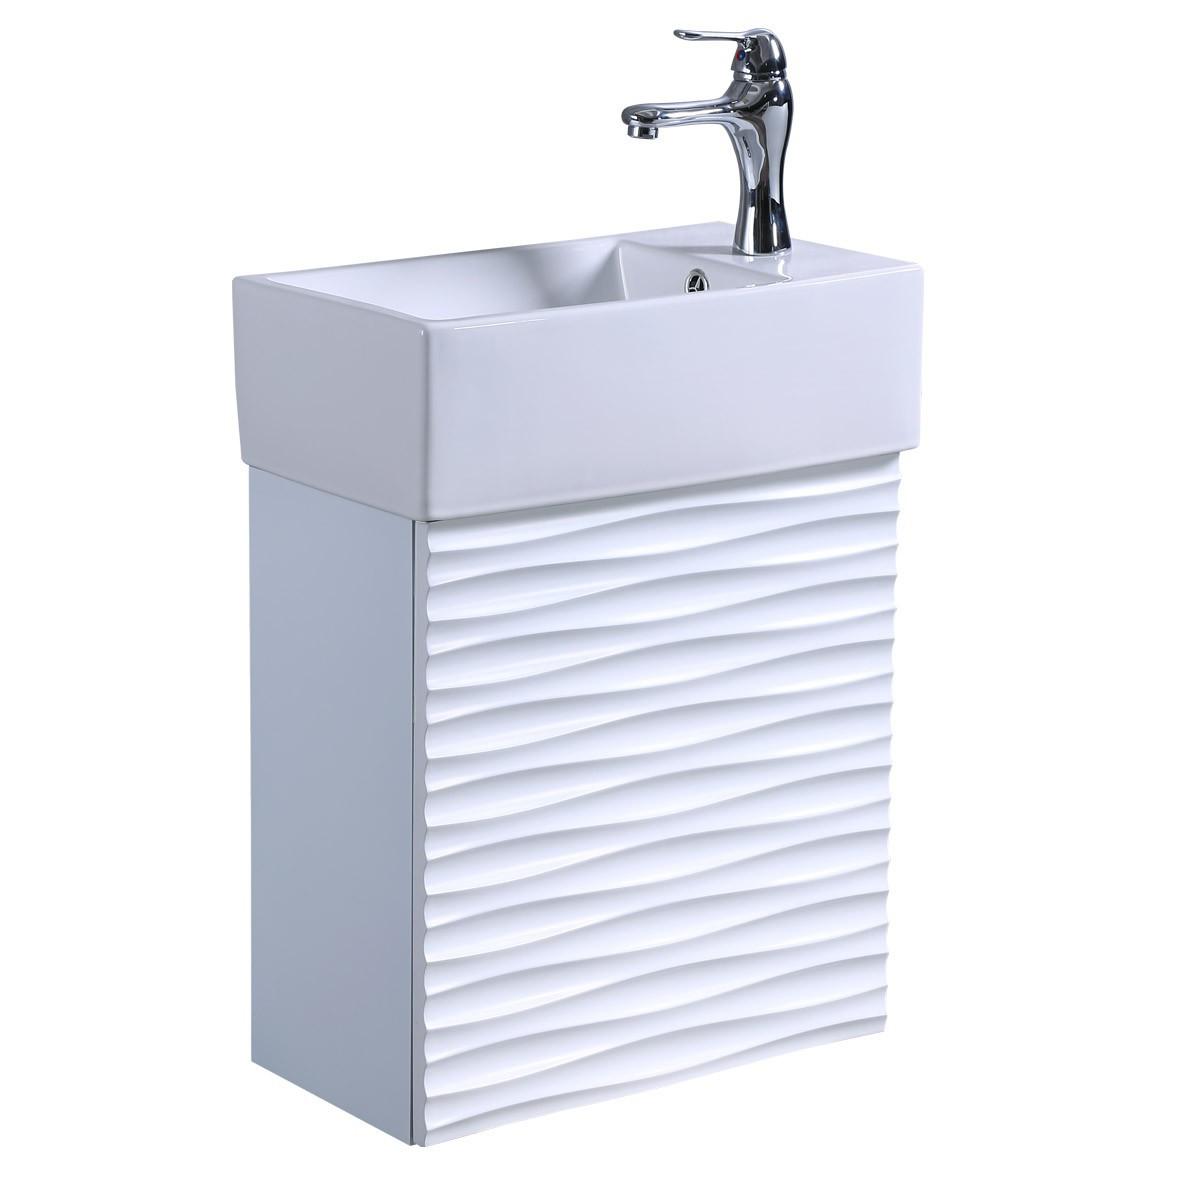 18 small bathroom sink vanity cabinet white rippled - Small bathroom sink and vanity combo ...